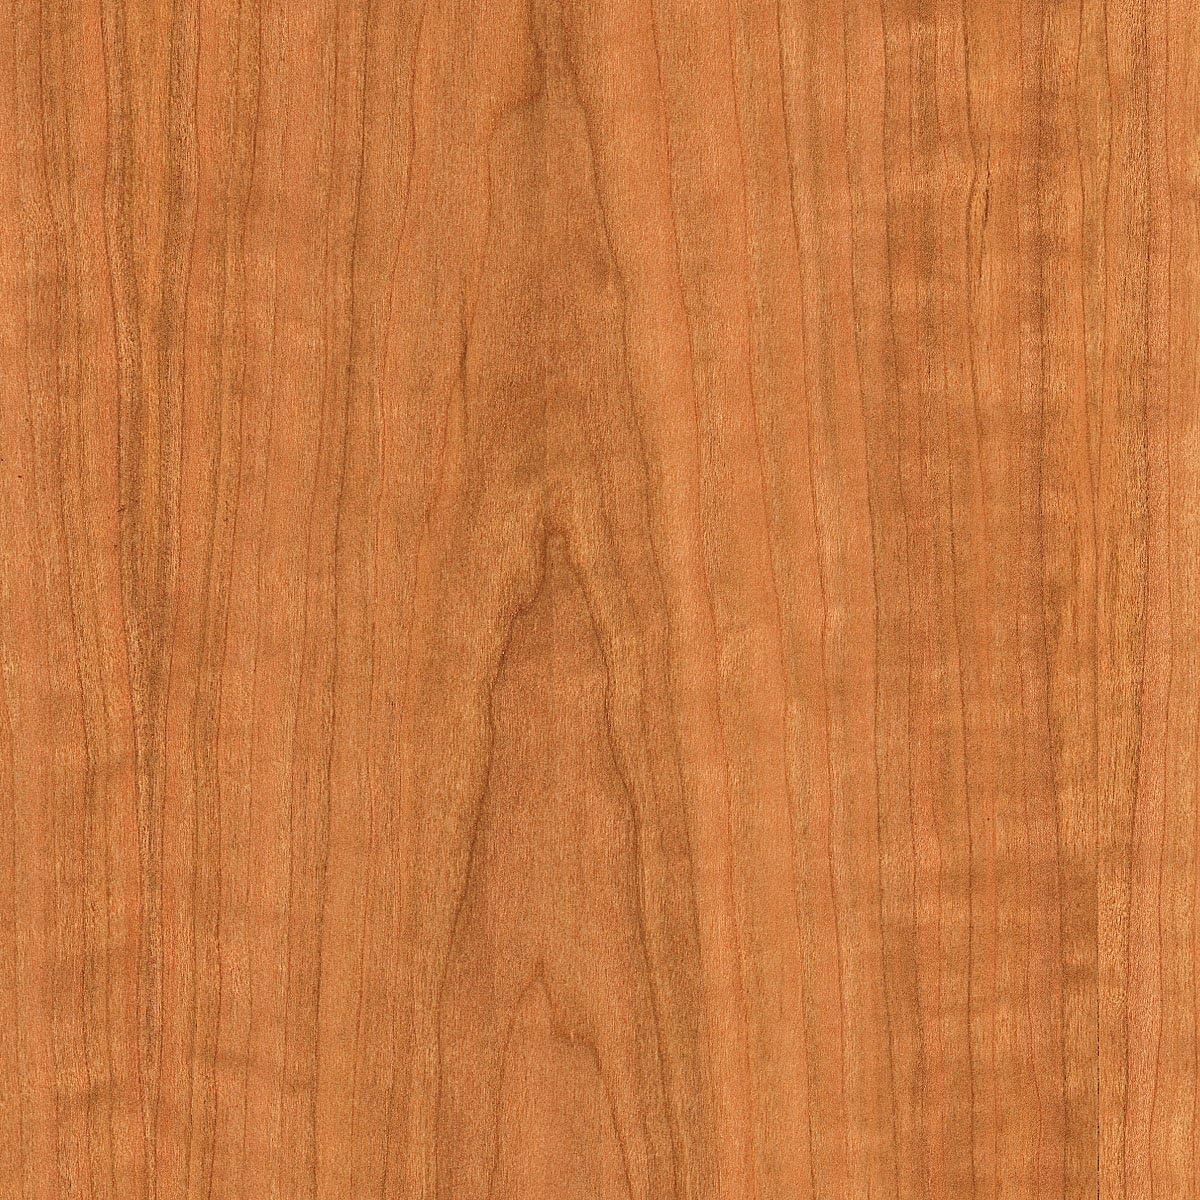 Wood-All Ranking TOP2 Cherry Wood Veneer Sheet 48x96